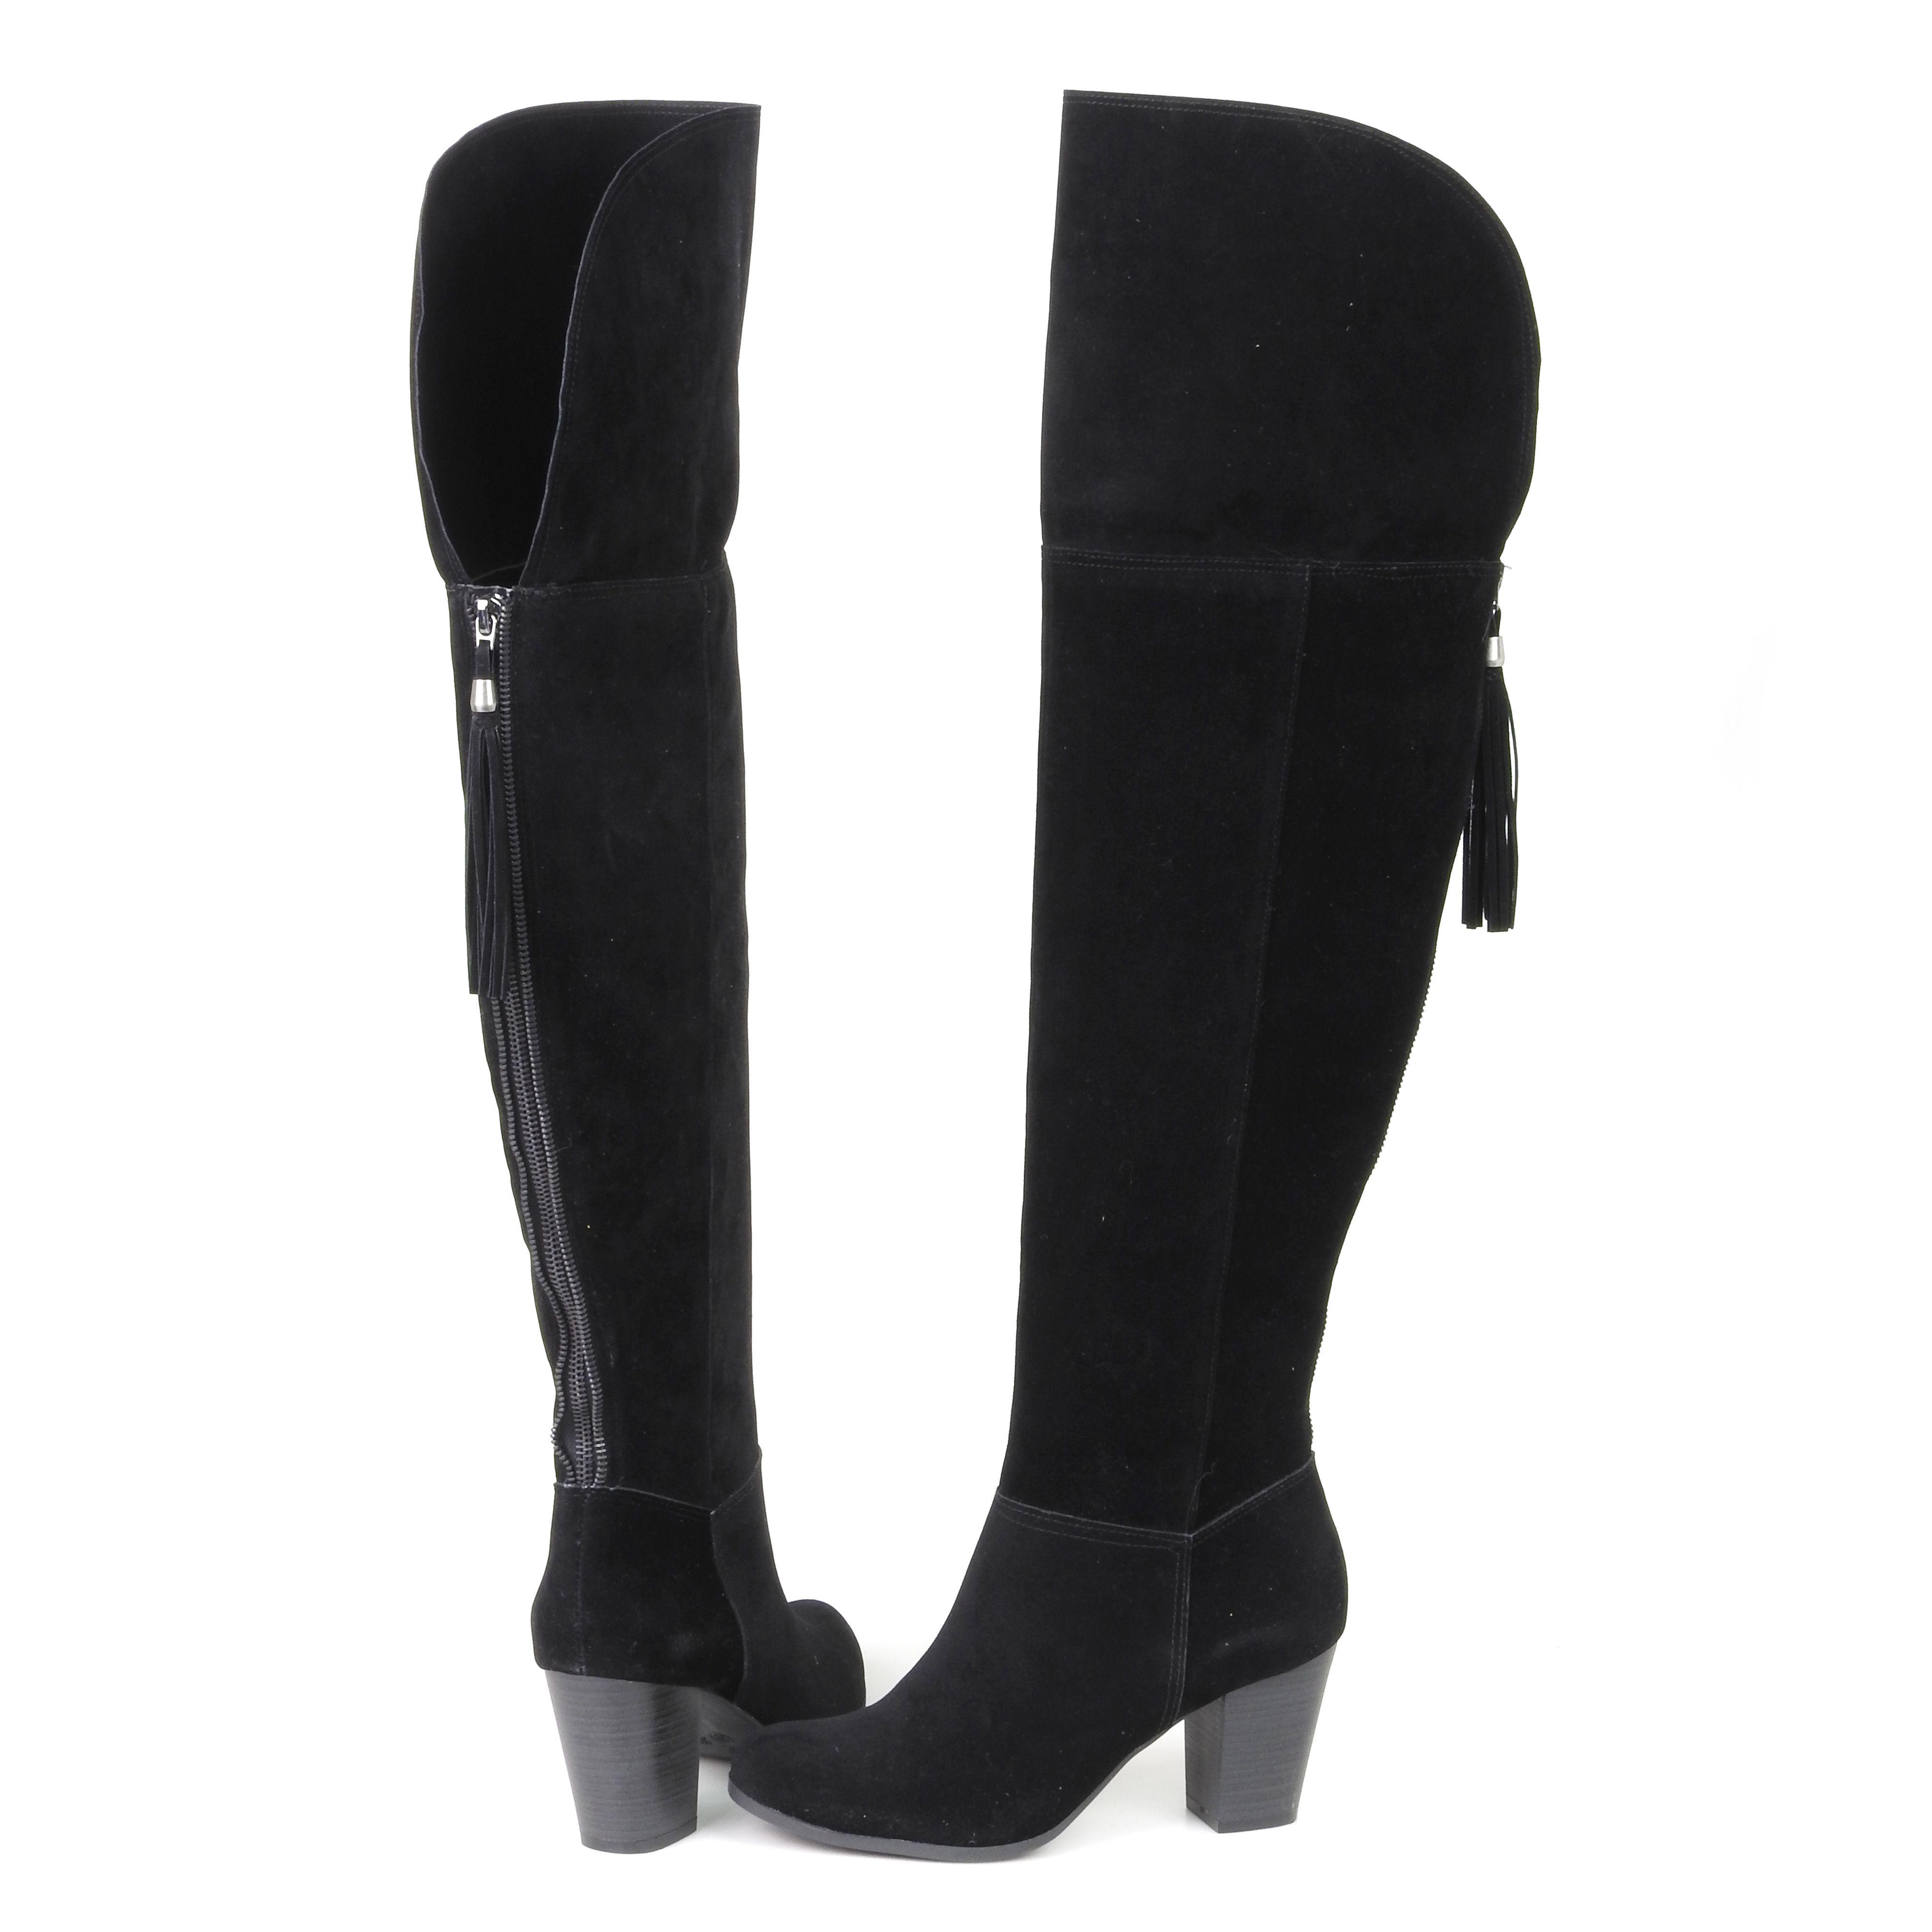 3bcc9bc8e boots - botas - bota over the knee - winter - Inverno 2016 - Ref. 16-7709